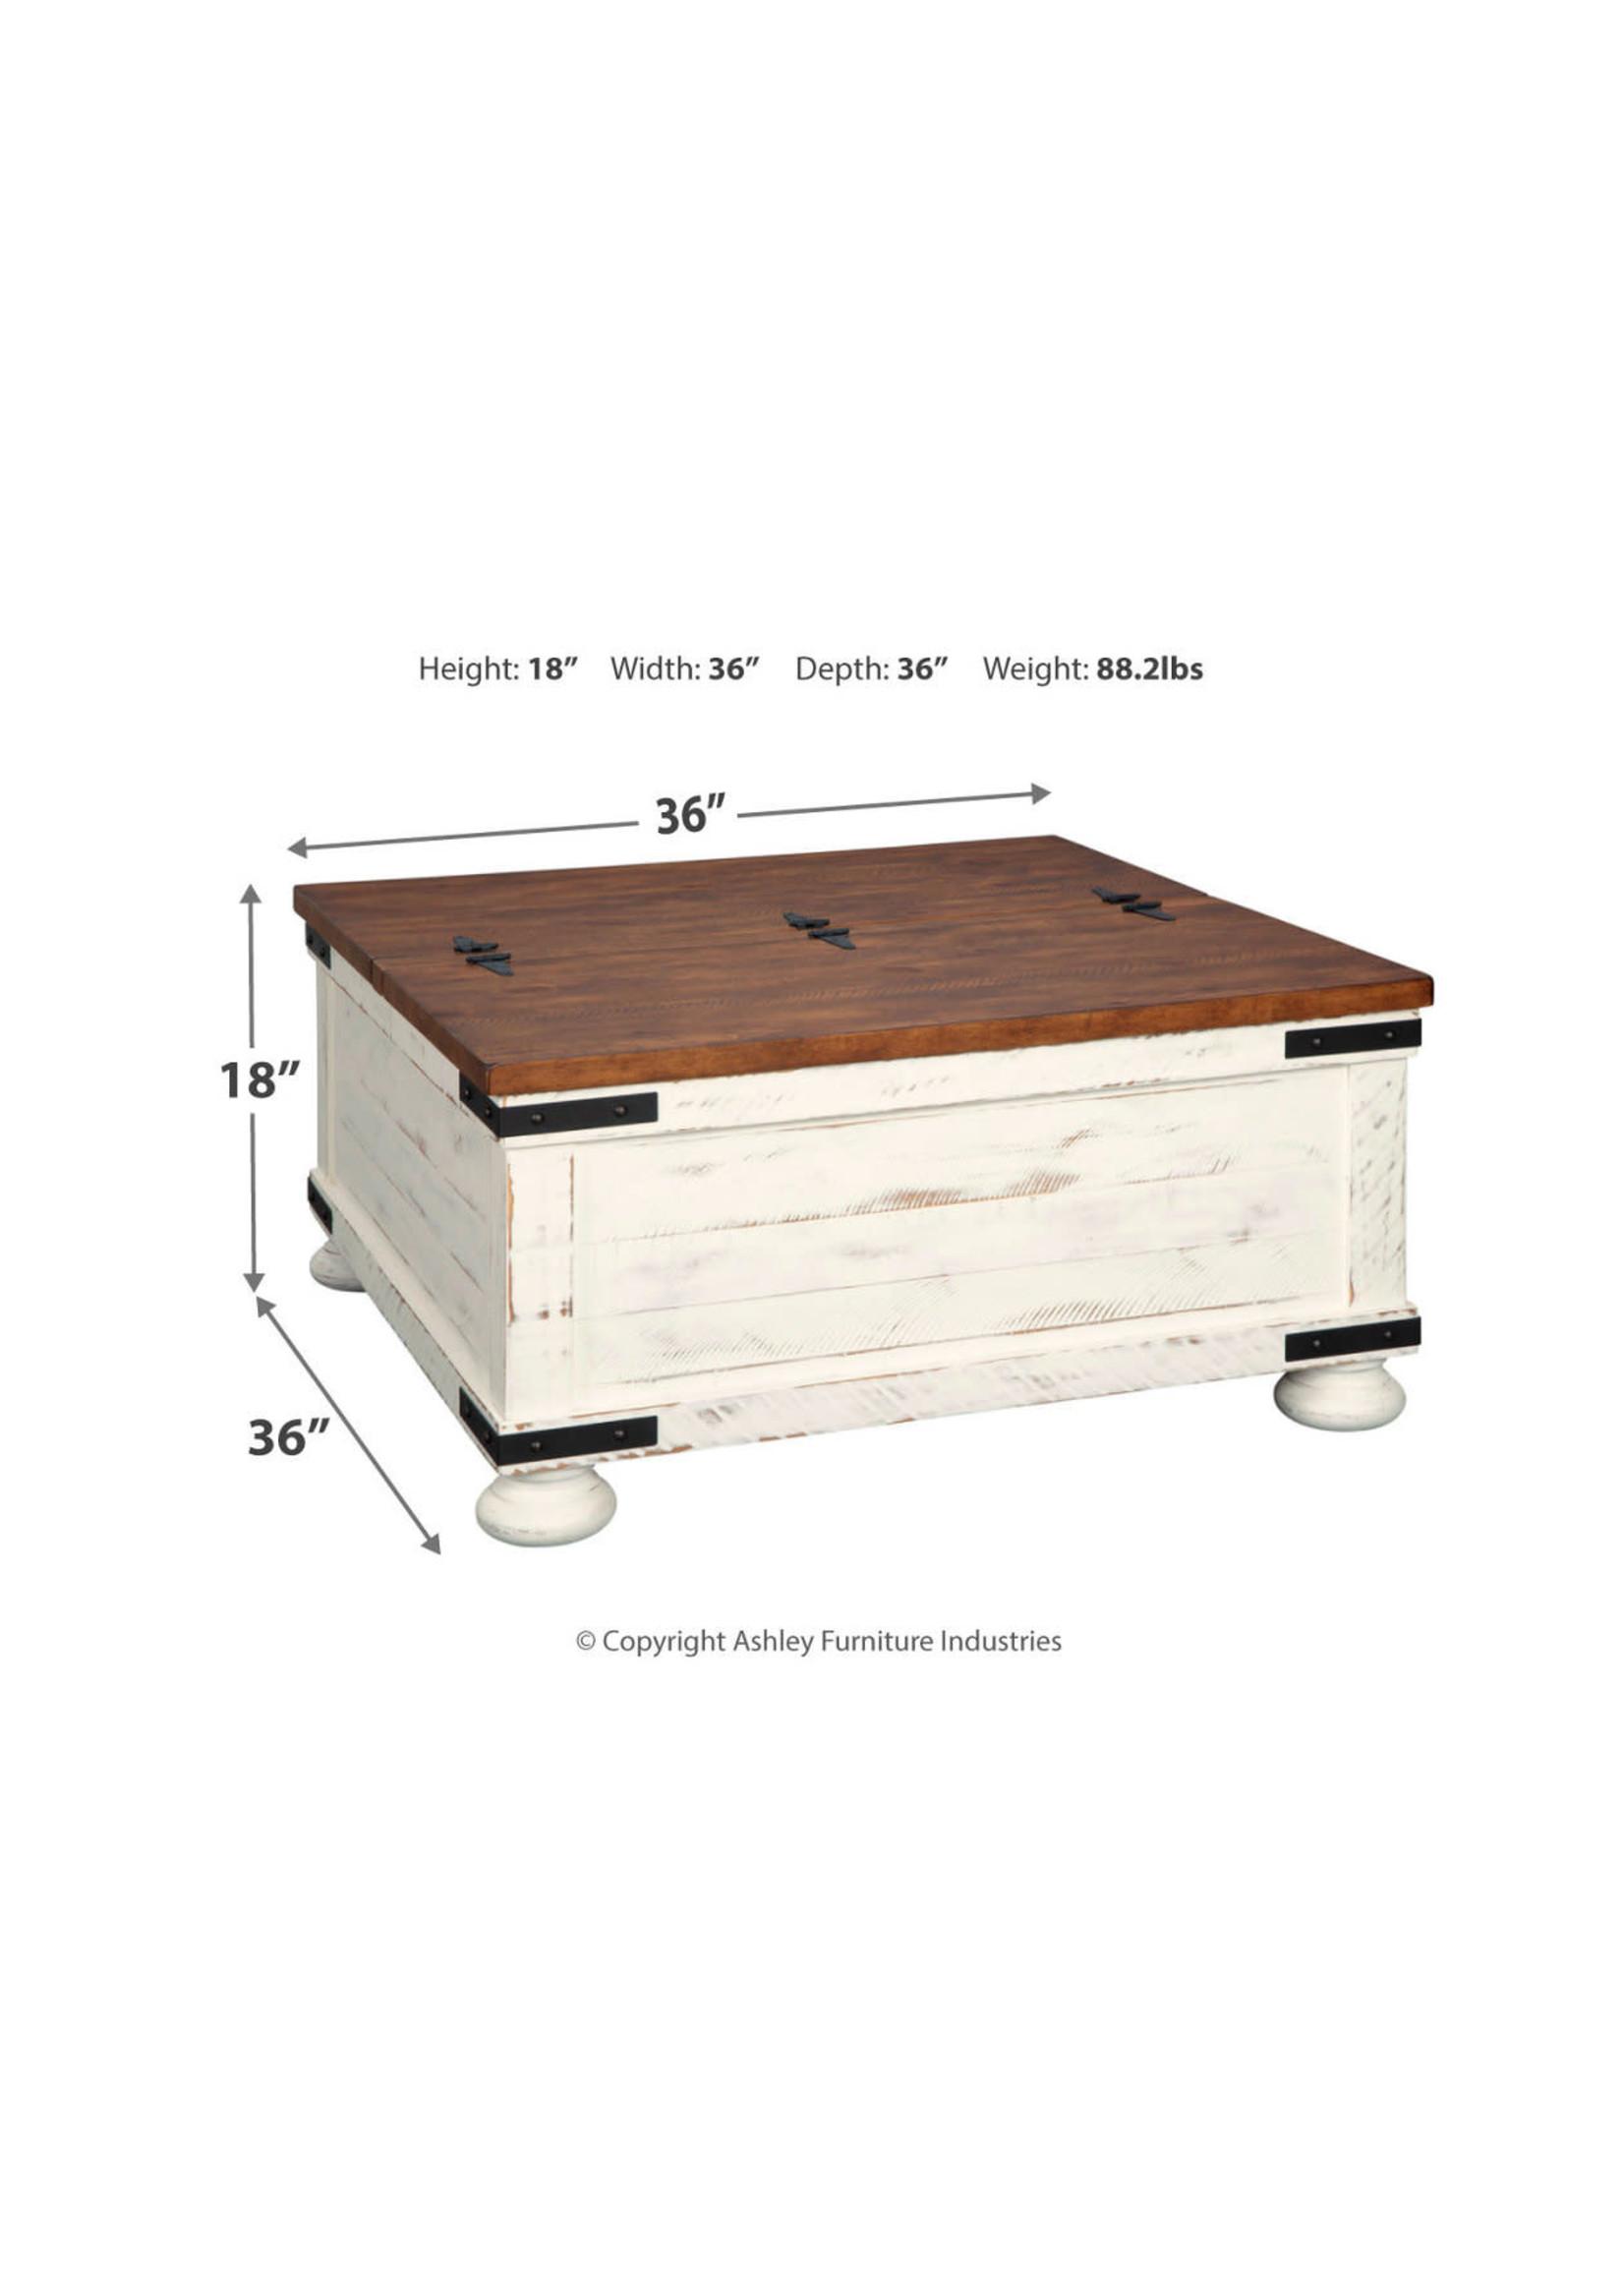 ASHLEY WYSTFIELD STORAGE COFFEE TABLE BROWN & WHITE